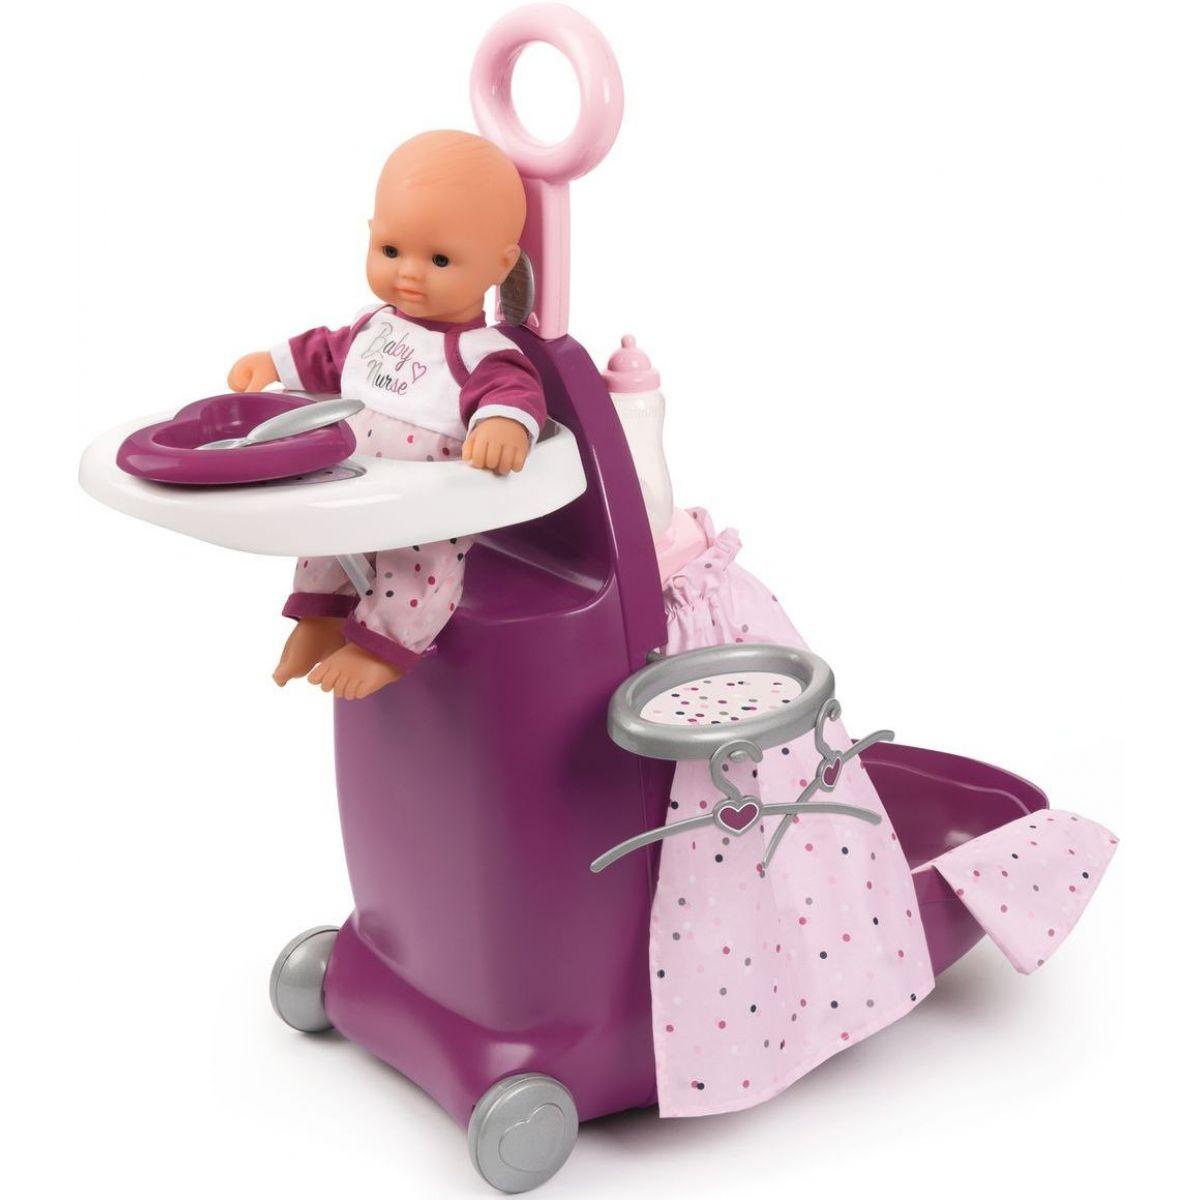 Smoby Baby Nurse Nursery kufrík 3v1